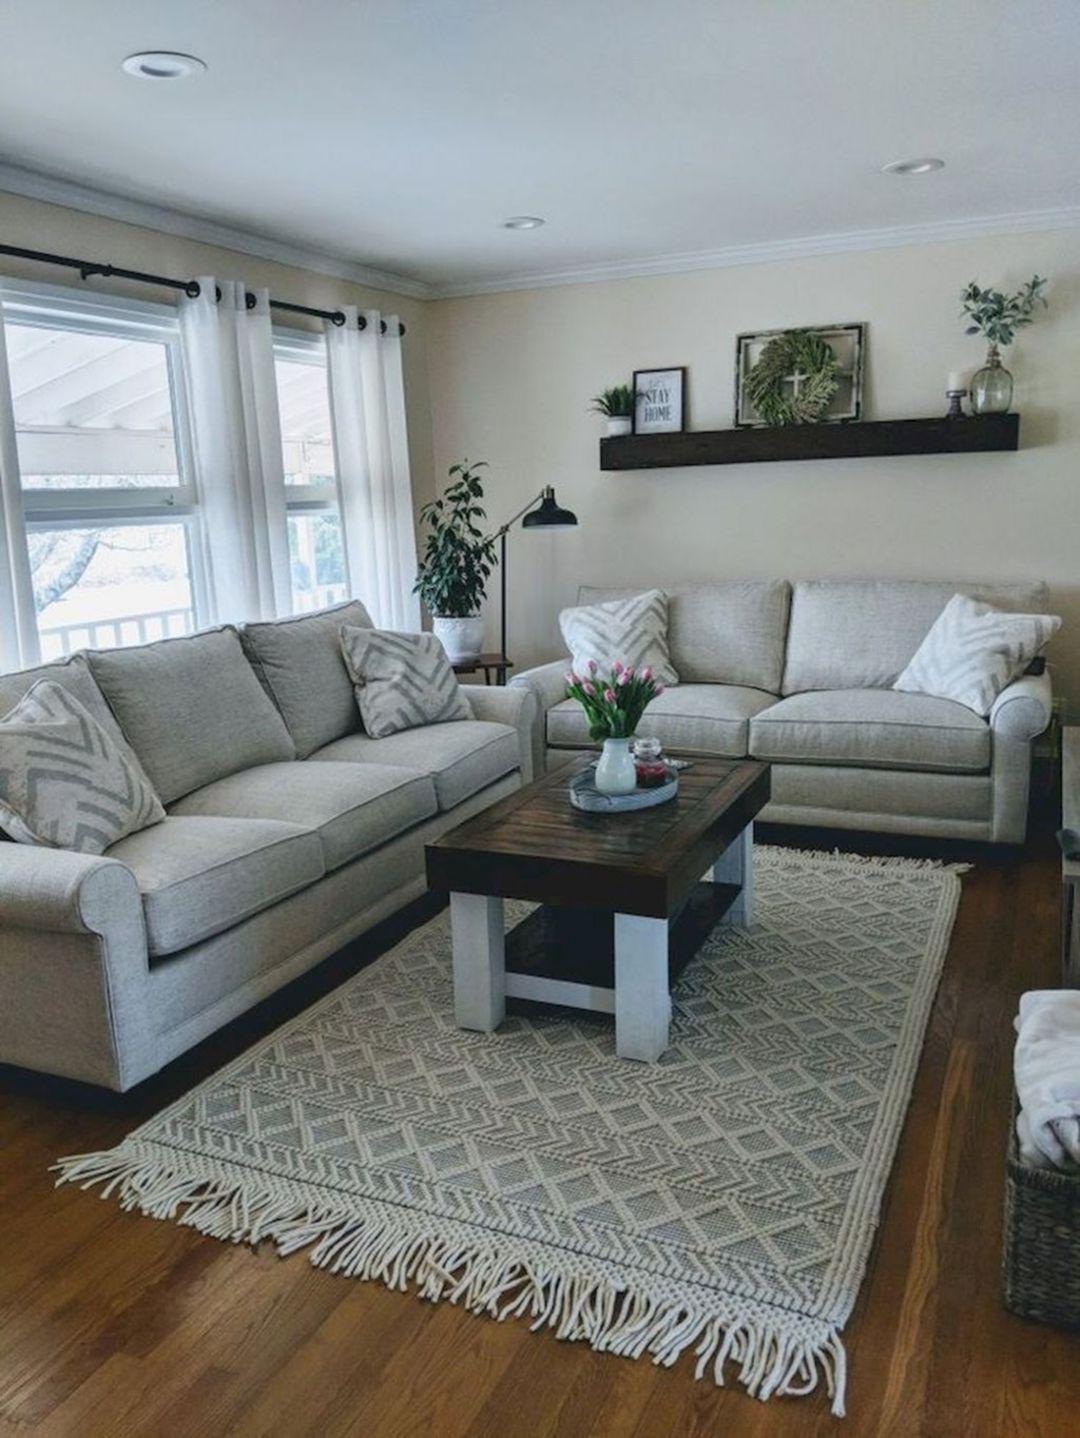 15 Best Decor Ideas For Your Small Living Room Apartment   Modern farmhouse living room decor. Living room remodel. Small living room design